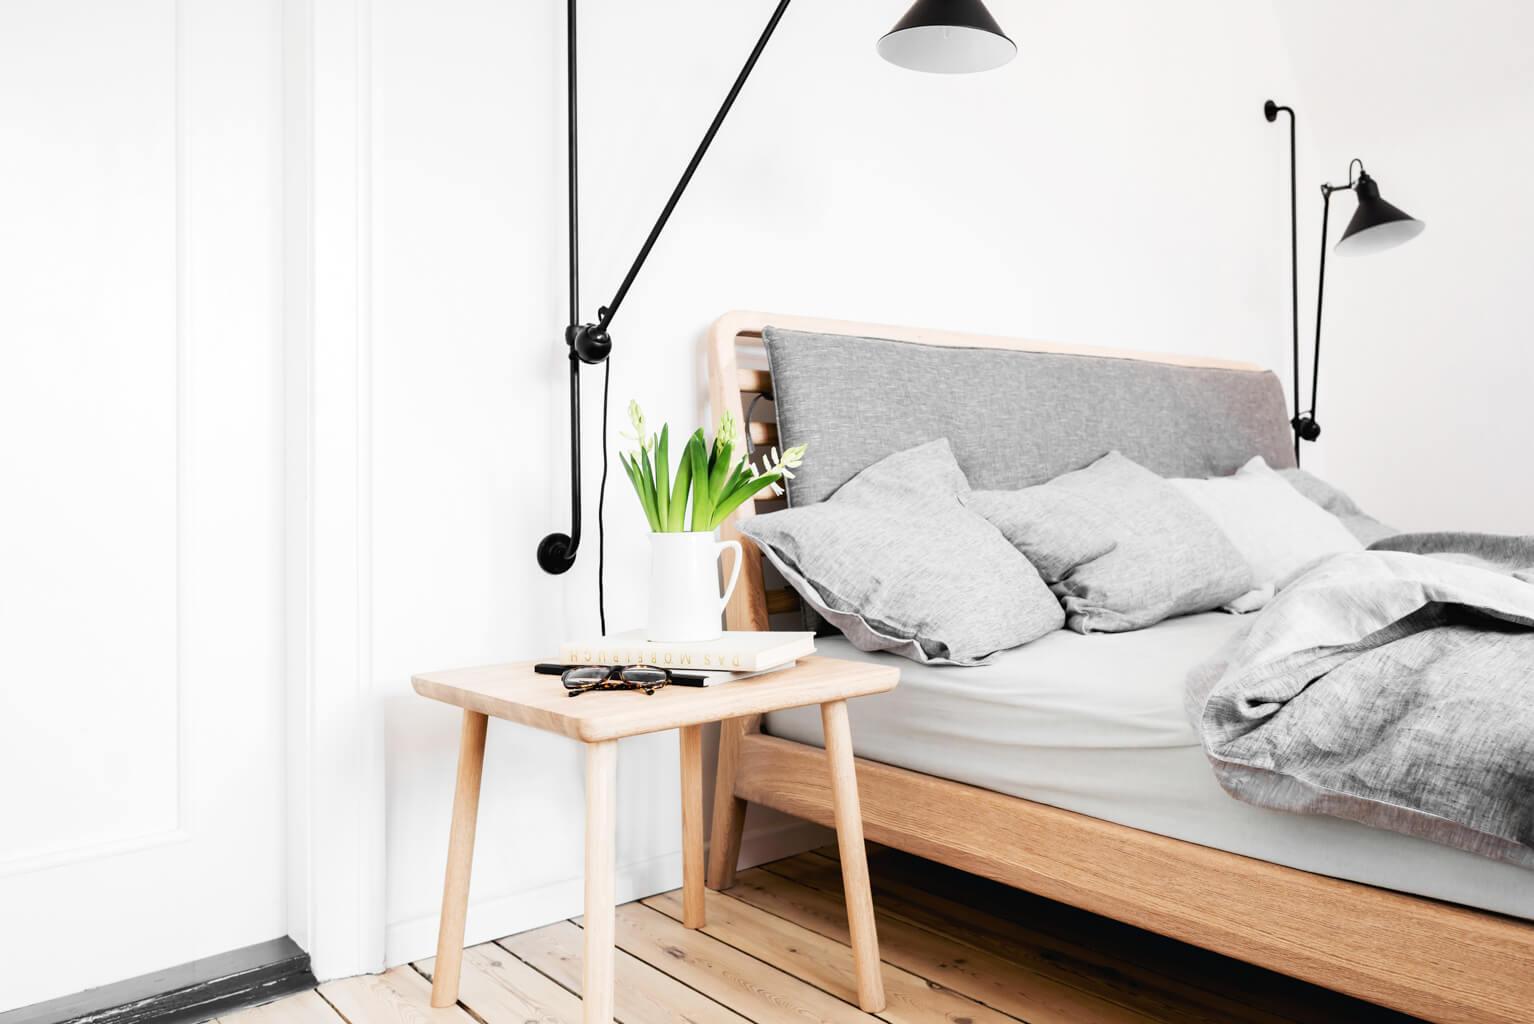 Quand minimaliste rime avec cosy frenchy fancy